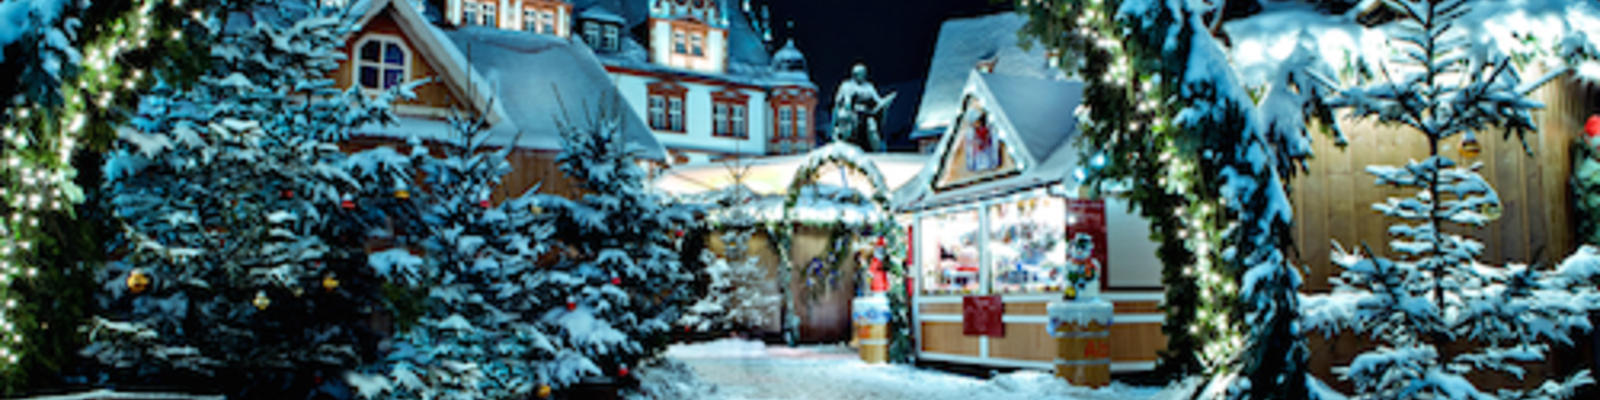 Top 5 White Christmas destinations